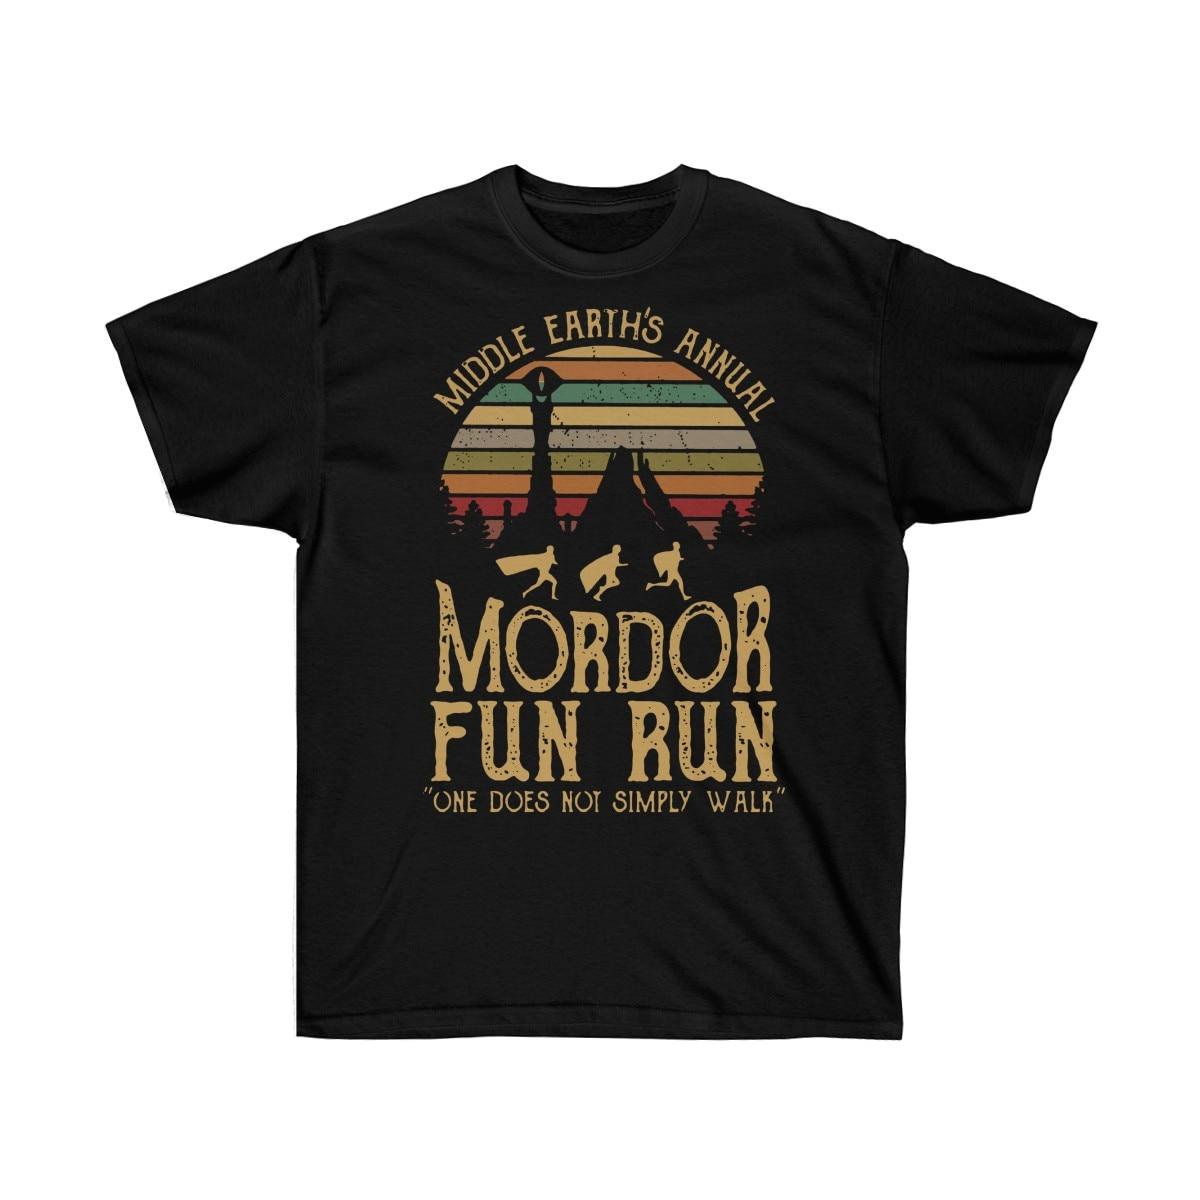 Mordor Fun Run Shirt, Sunset Mordor Tshirt, LOTR Inspired Tshirt, Sauron Shirt, Geek Movie Tshirt, Running Motivation Tee,